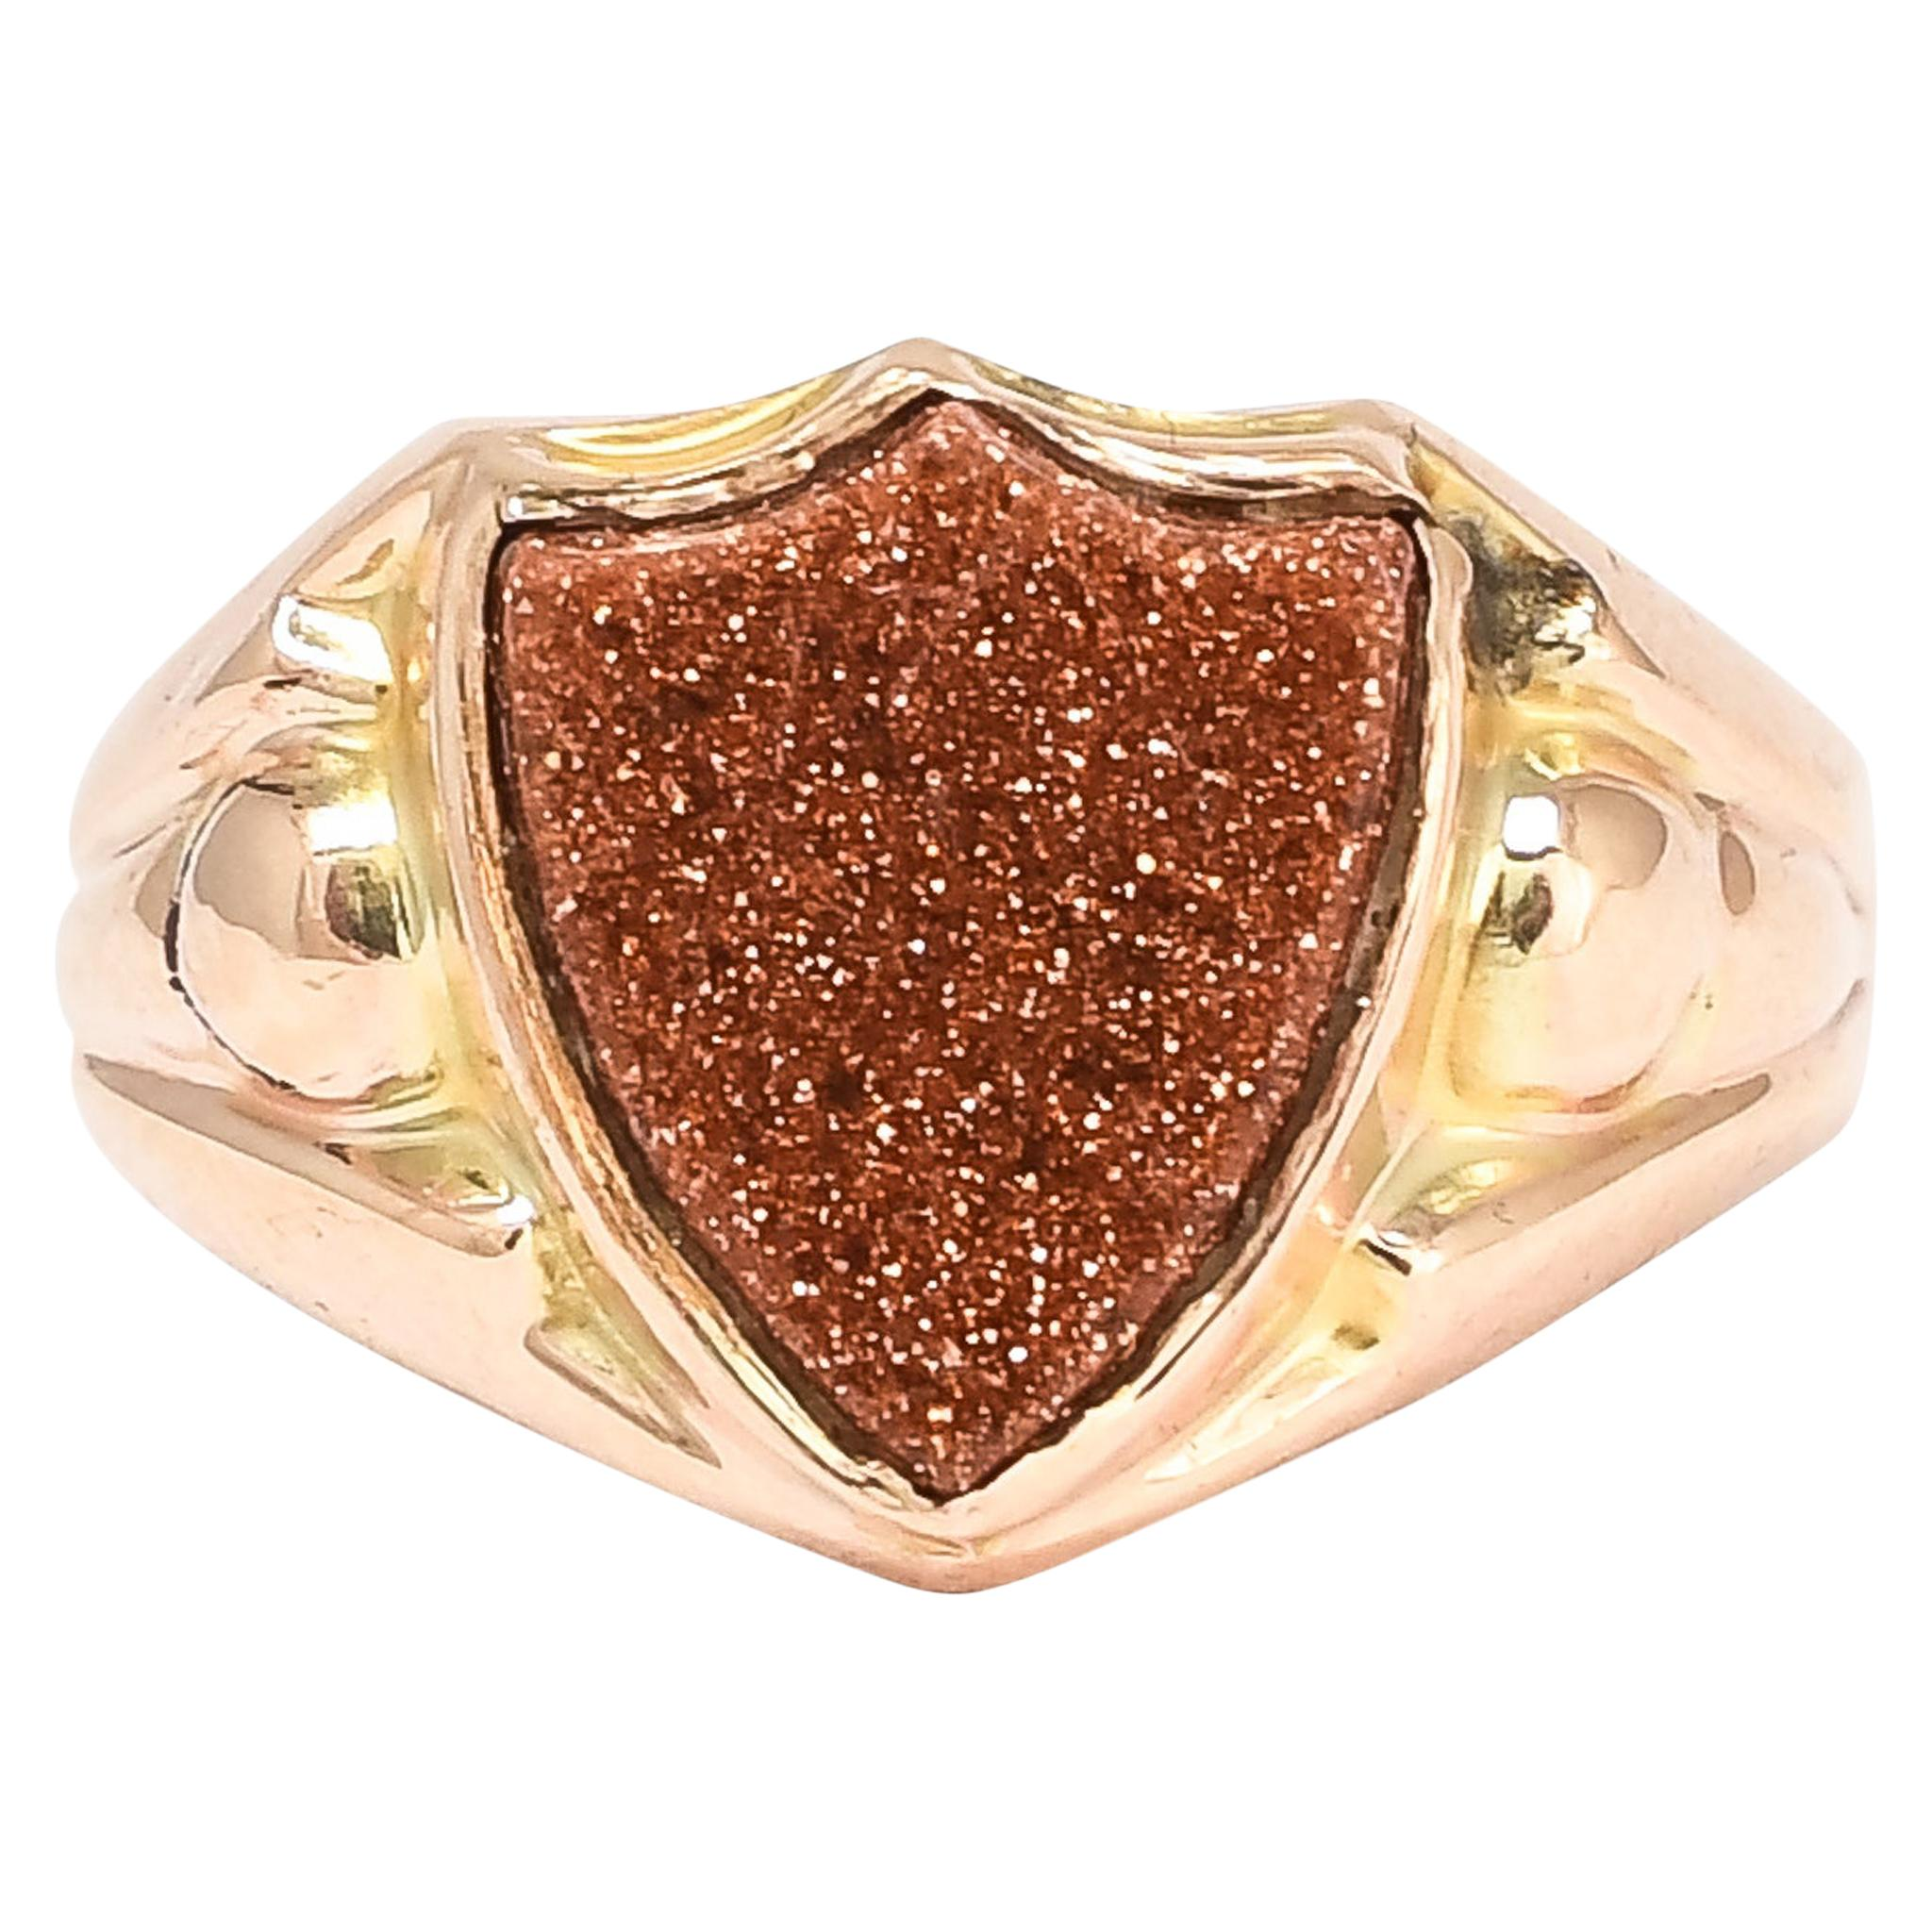 Antique Edwardian Goldstone Shield Signet Ring